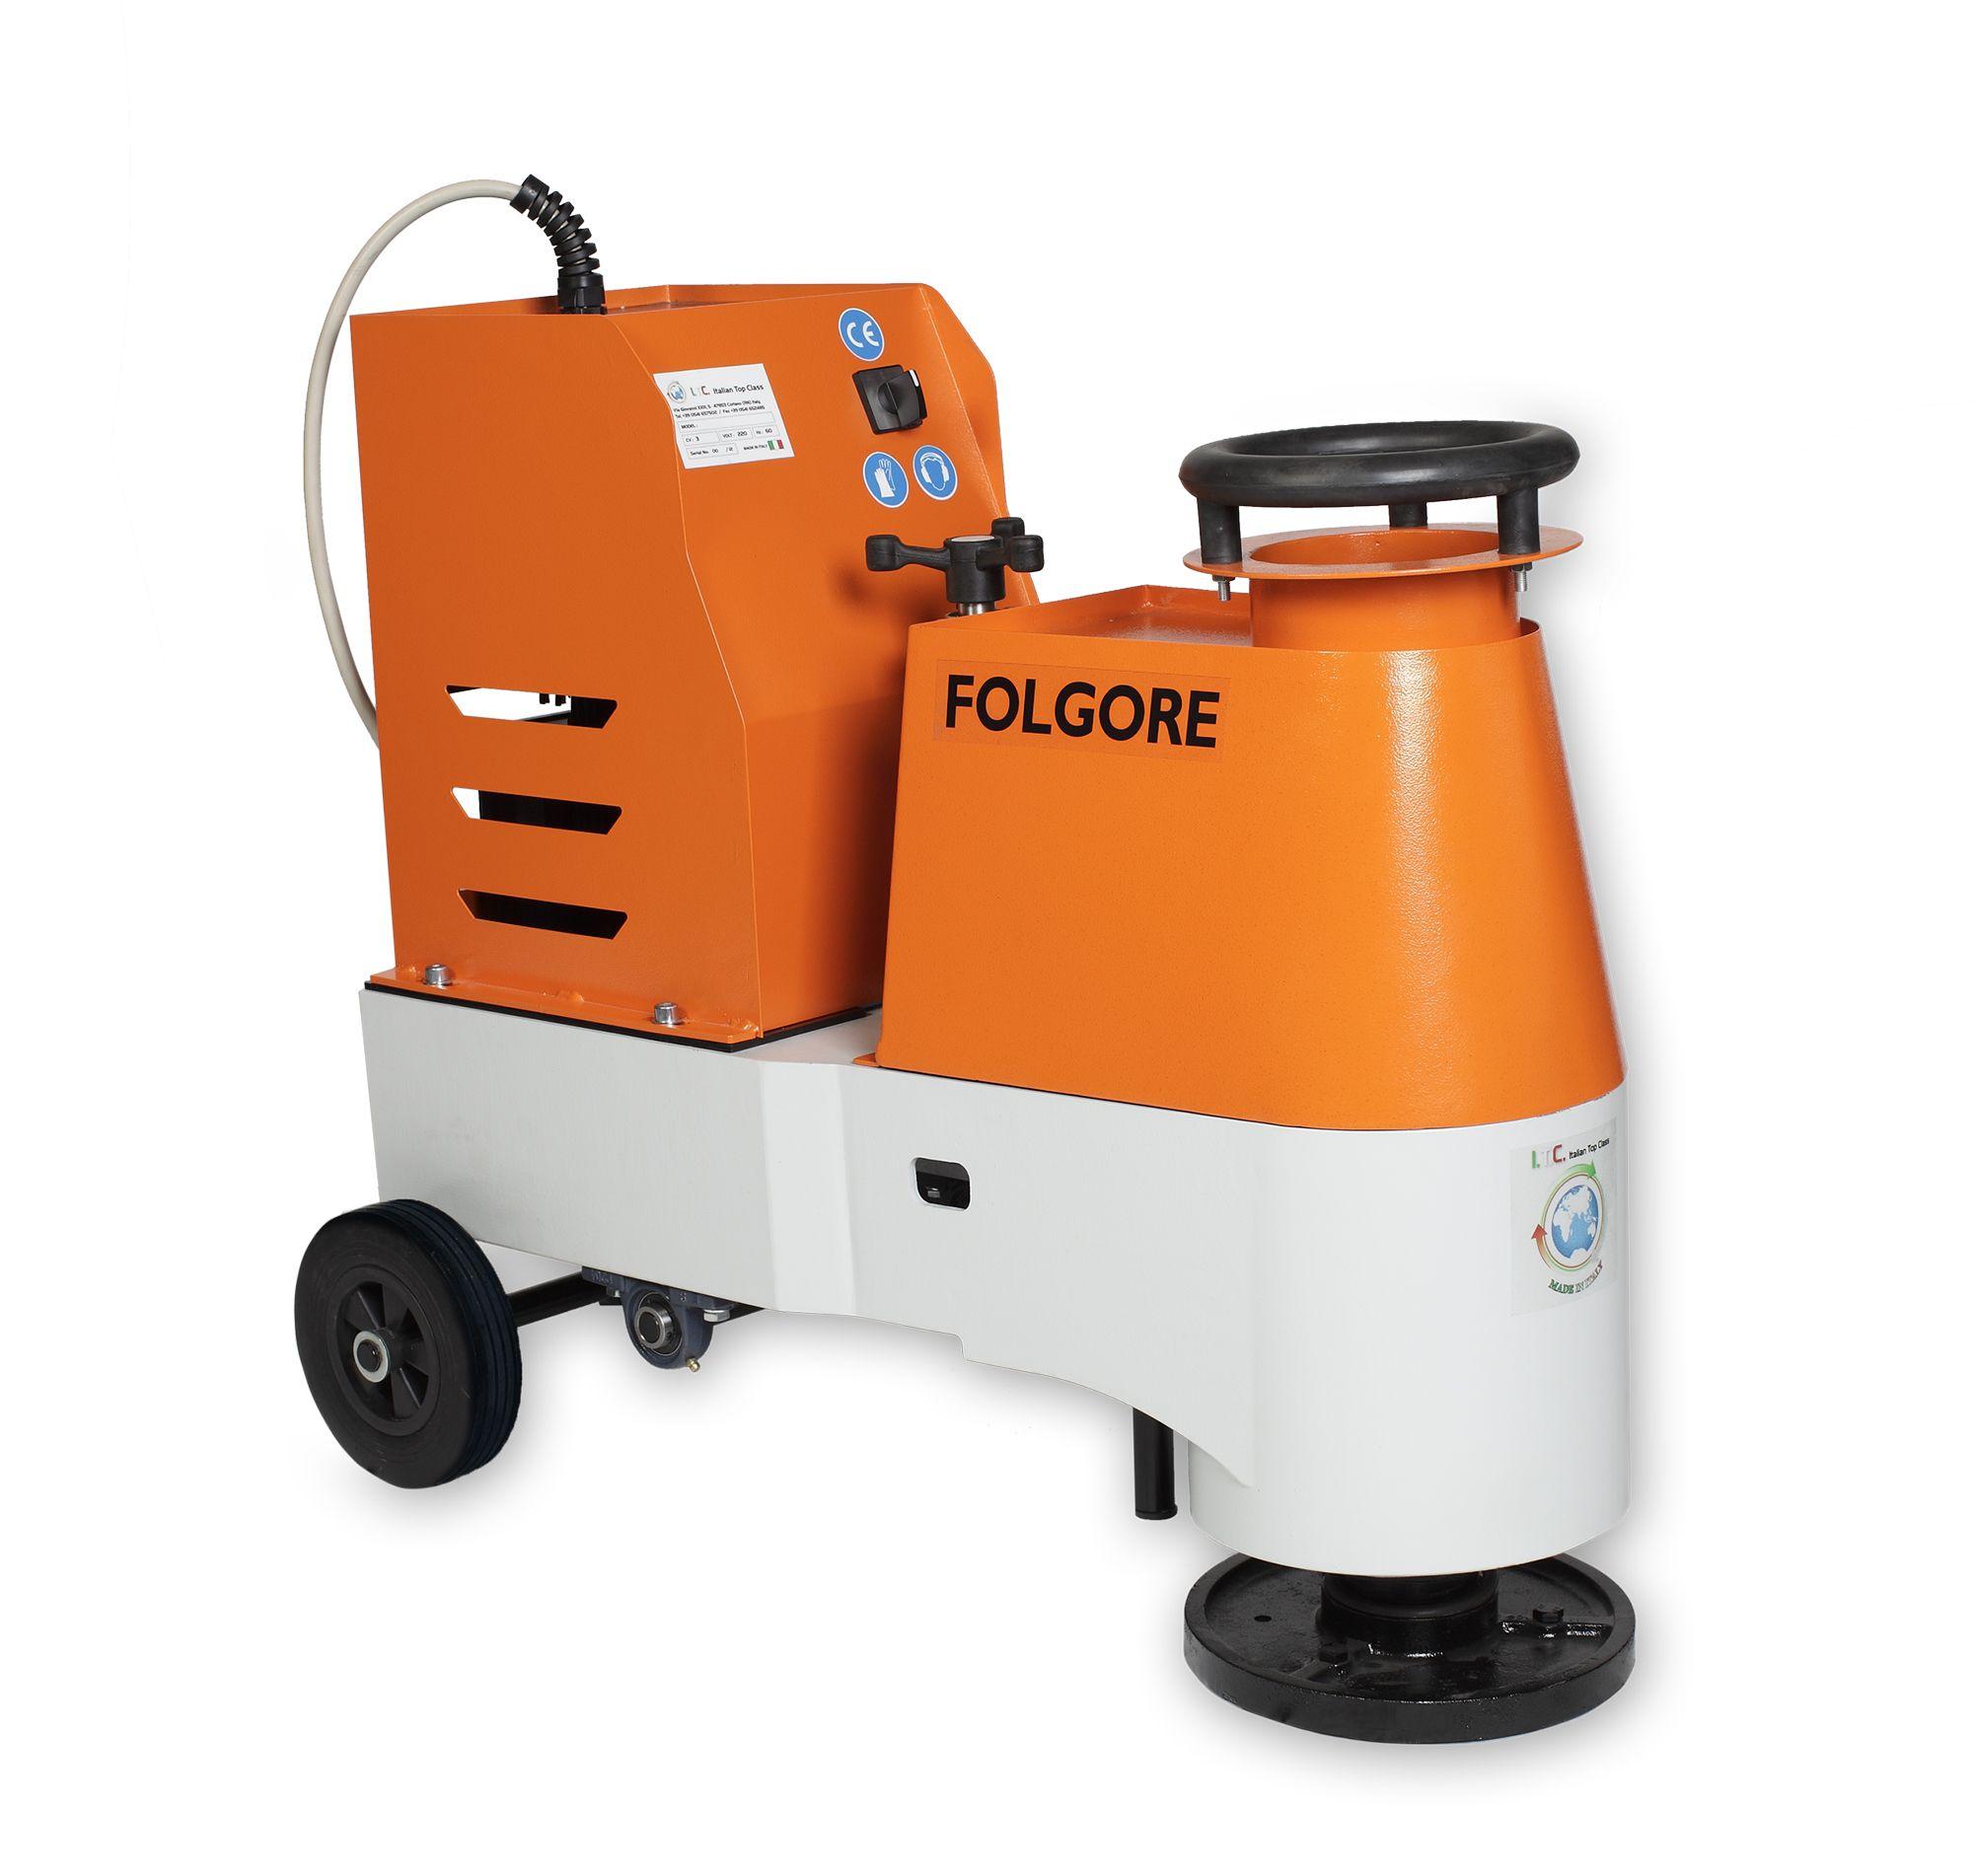 ITC FOLGORE - floor grinding/polishing machine.